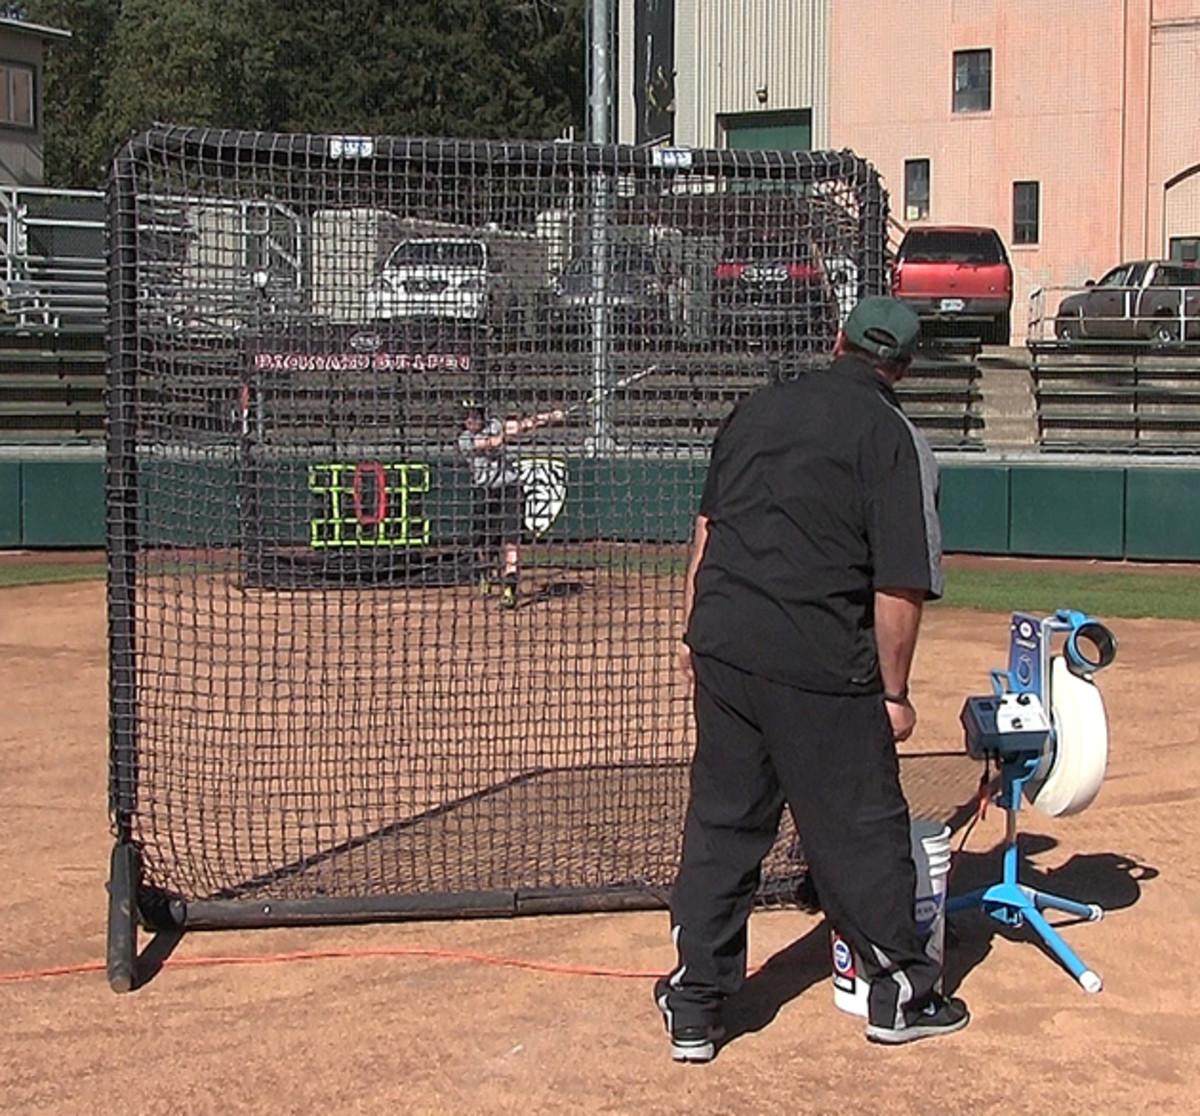 jugs-pitching-machine-action.jpg